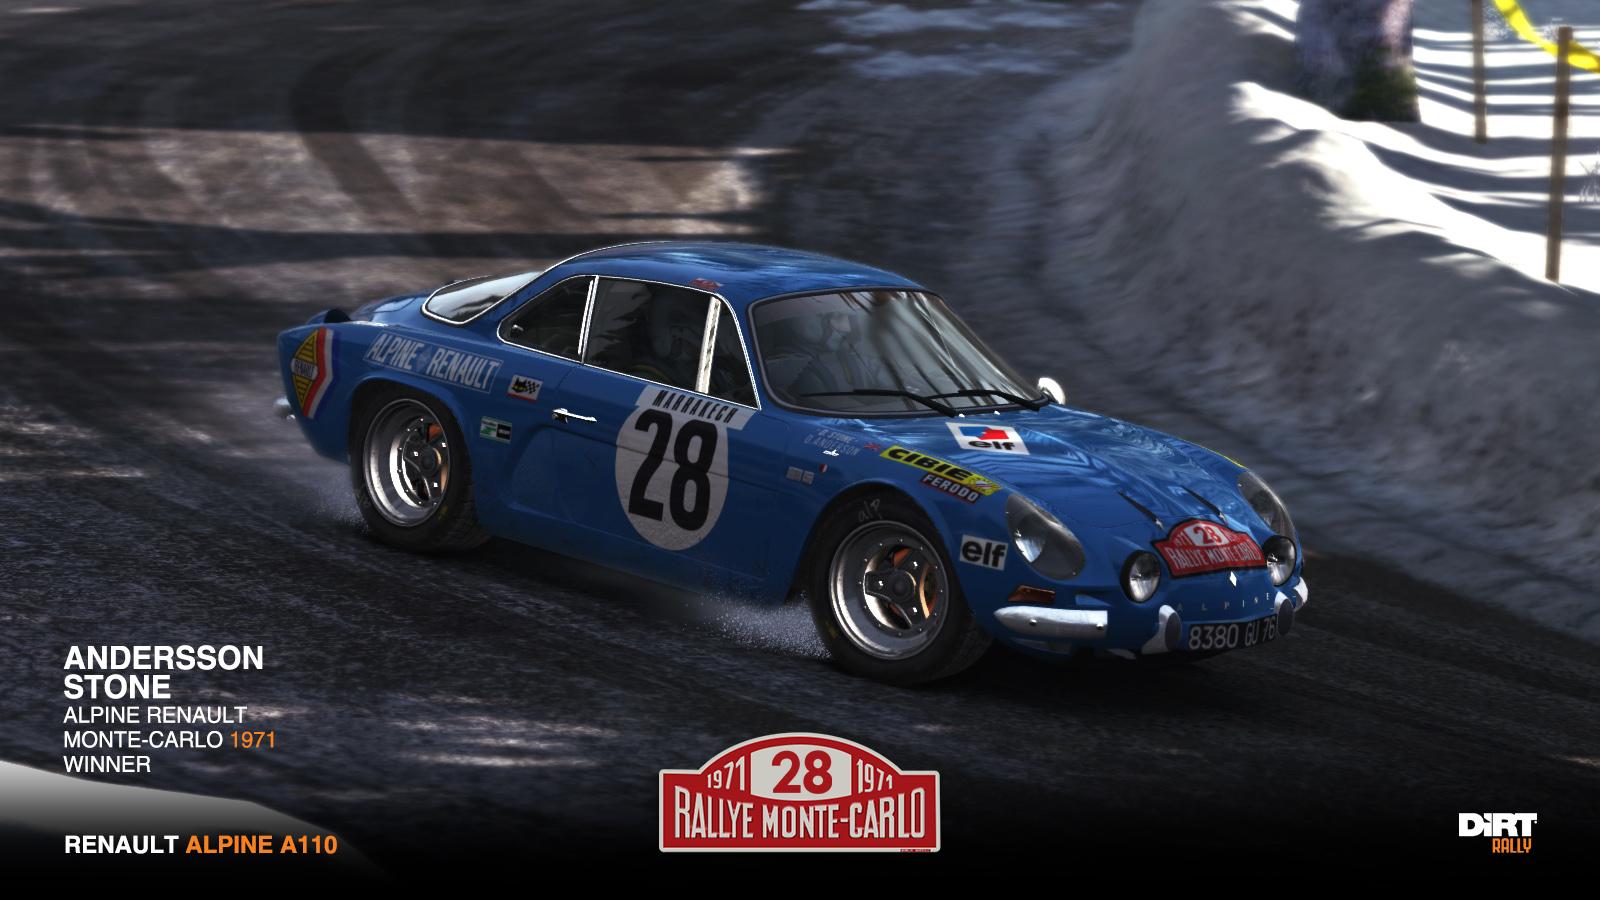 Renault Alpine A110 Monte Carlo 1971 Racedepartment